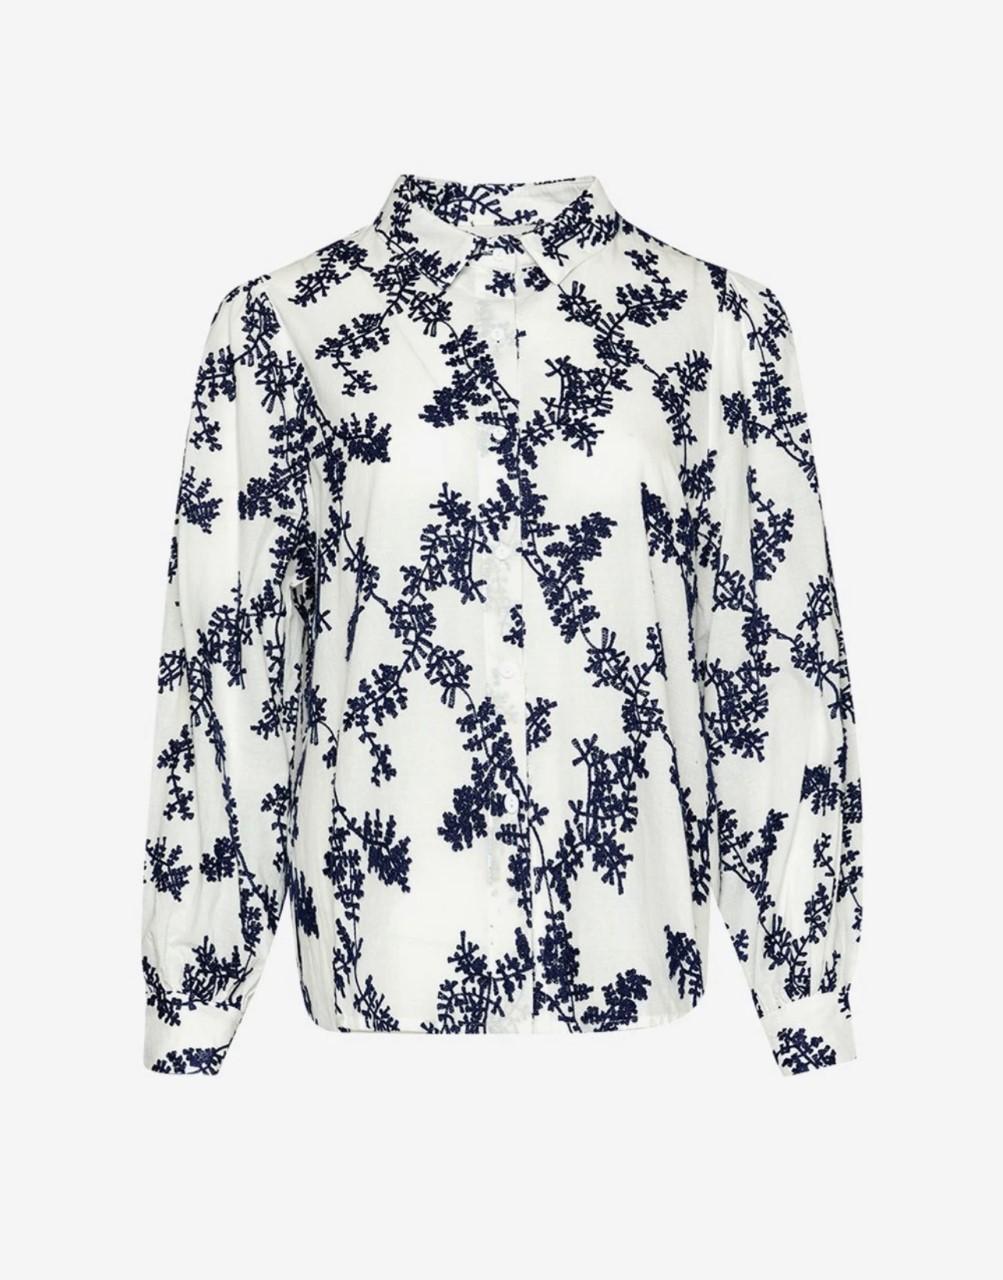 Noella Frilla shirt Bluse(4)